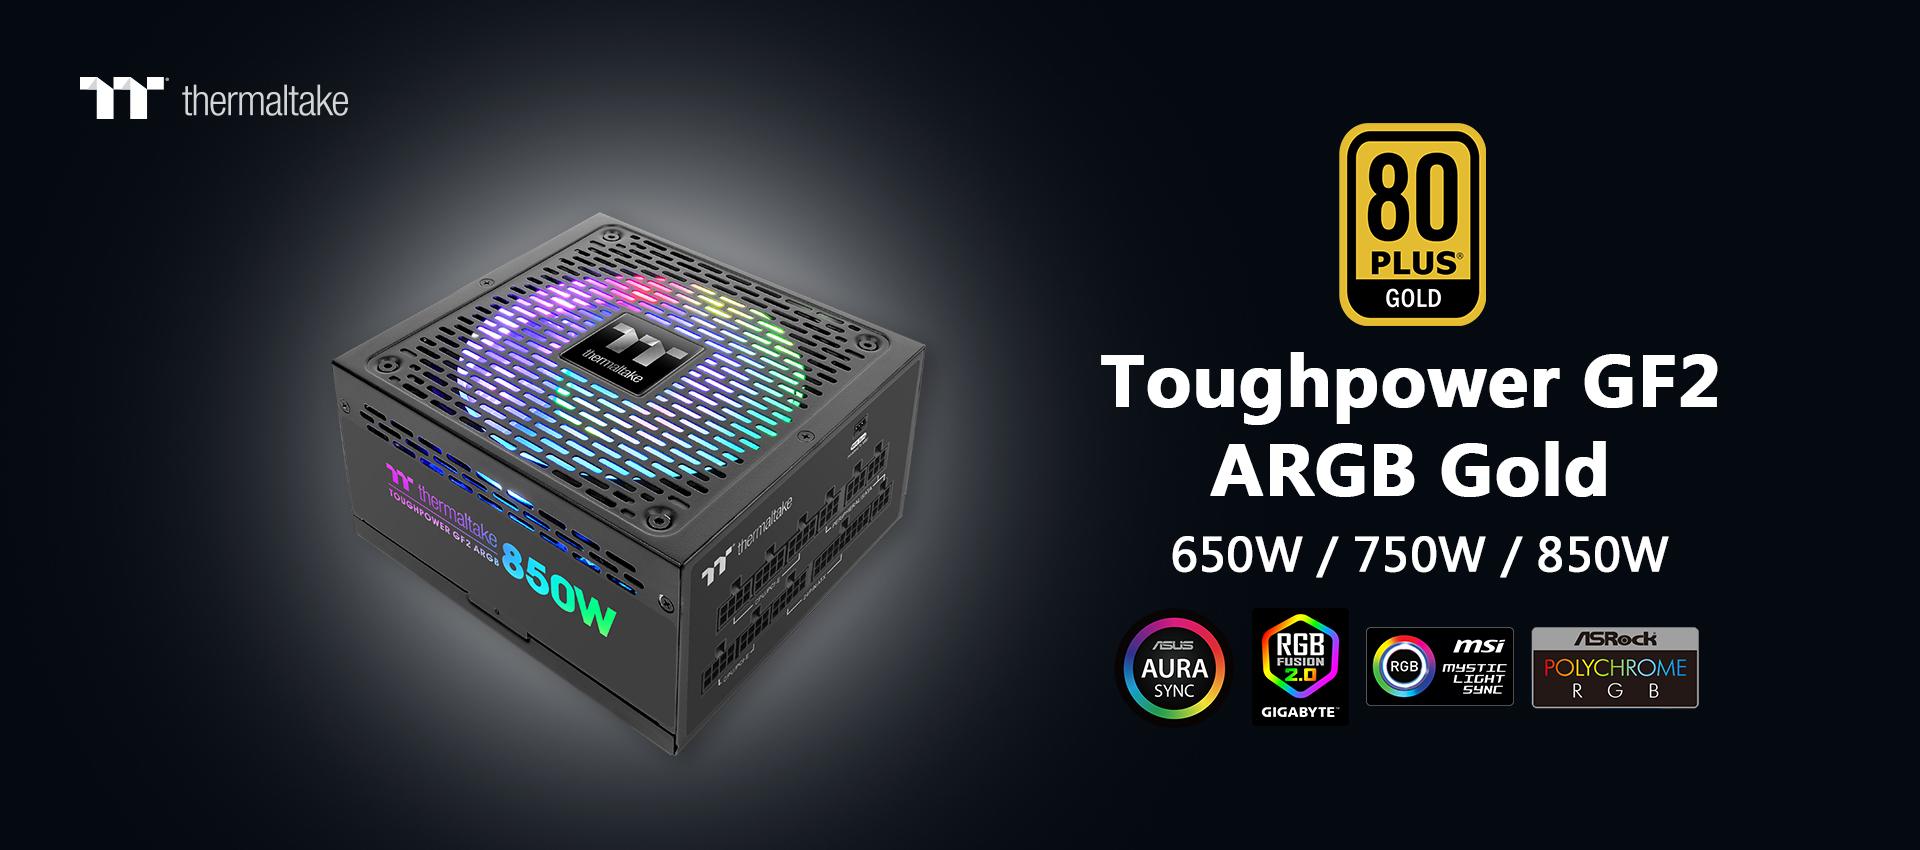 toughpower-gf2-argb-850w-tt-premium-edition